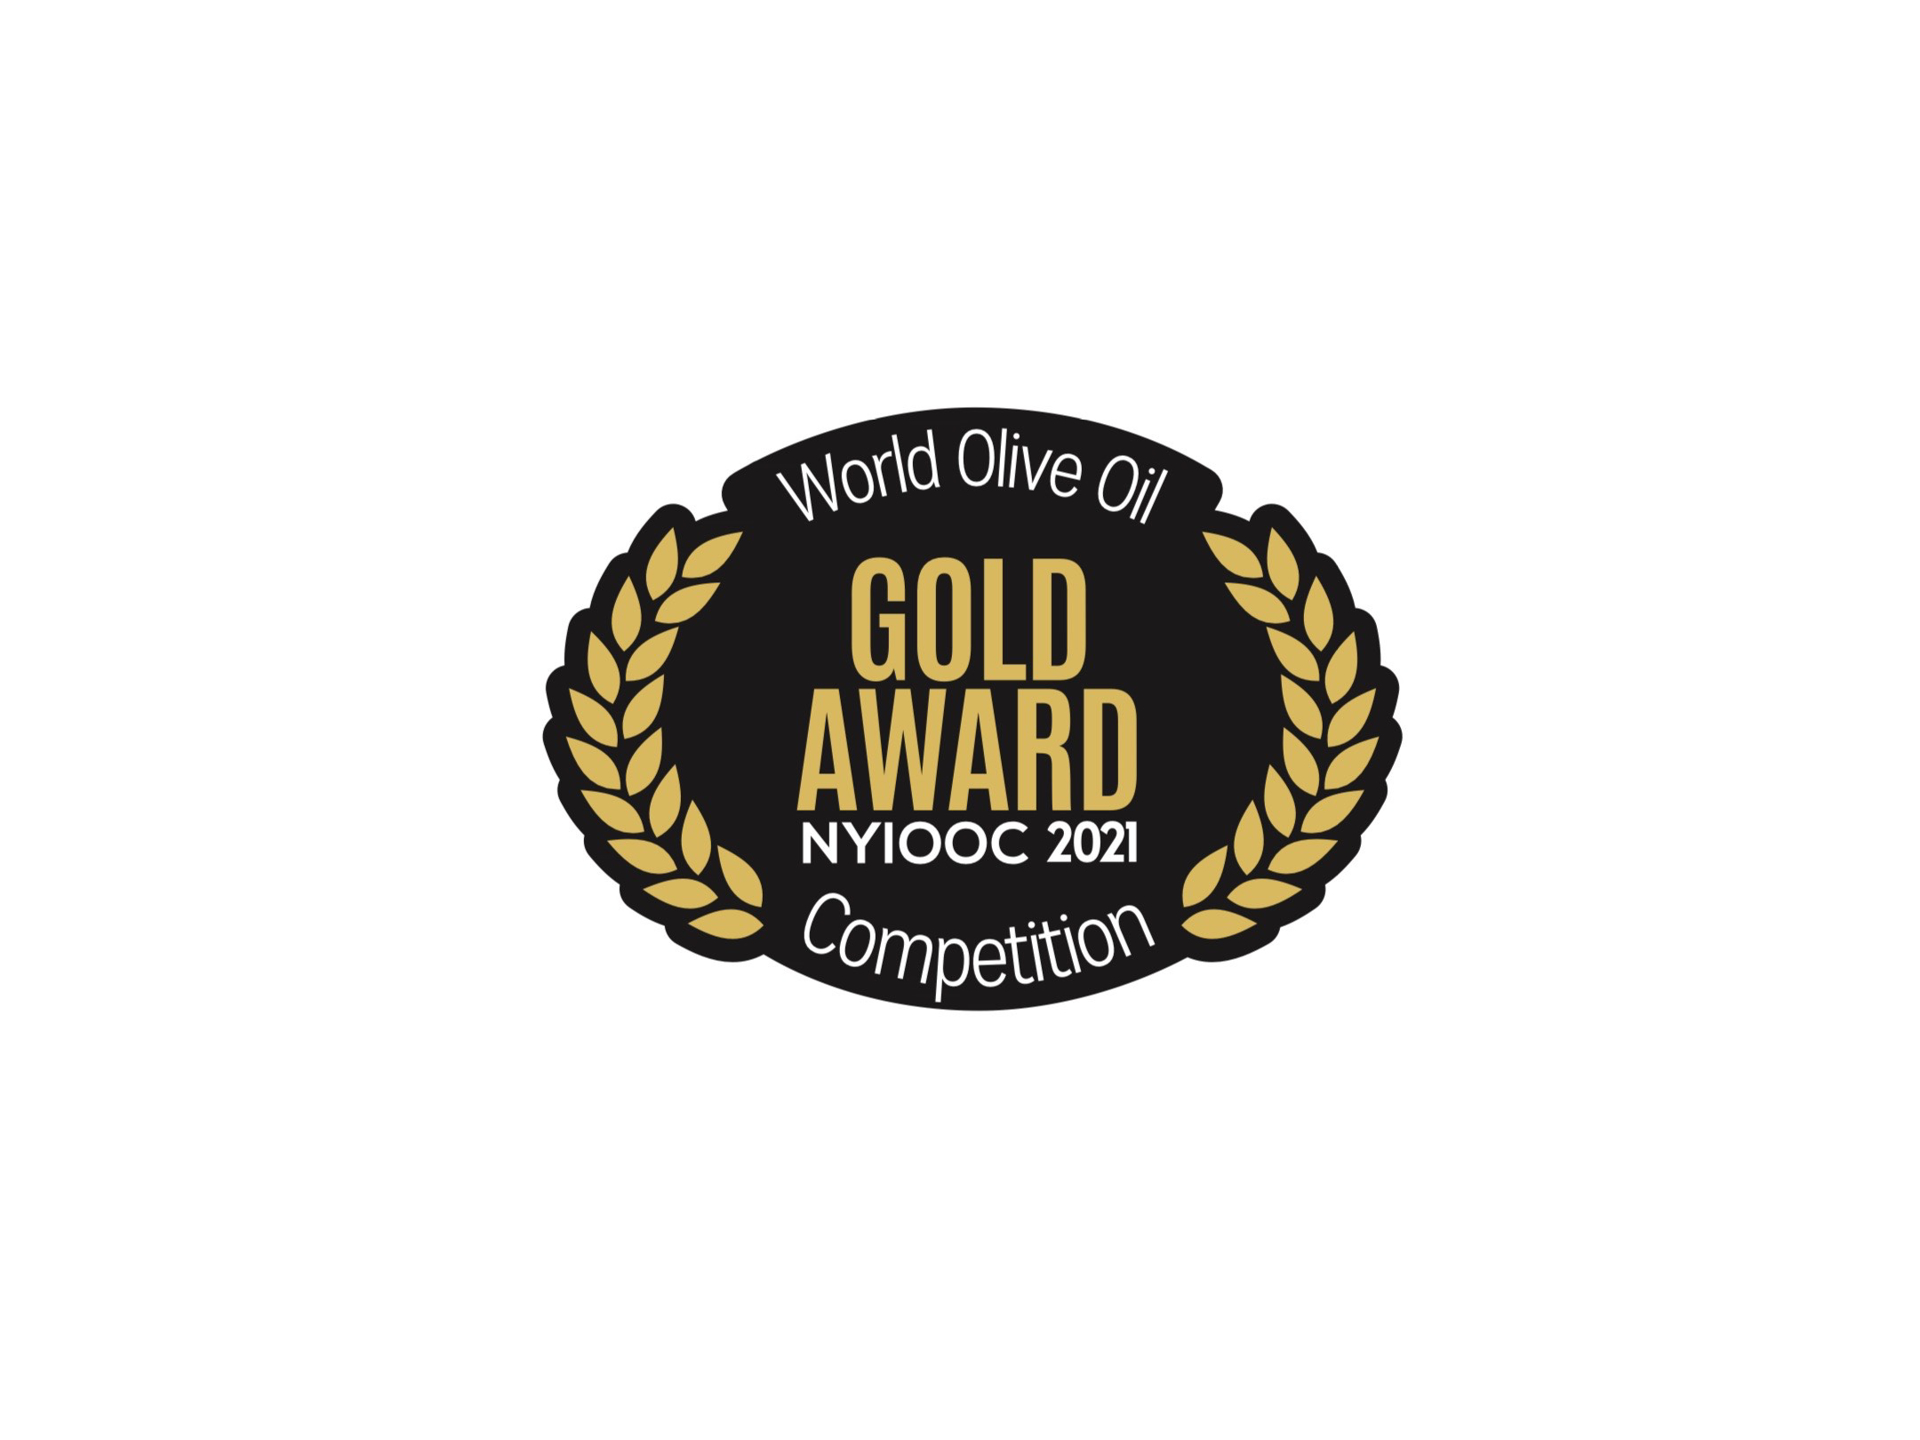 NYIOOC 2021 GOLD AWARD CERTIFICATION